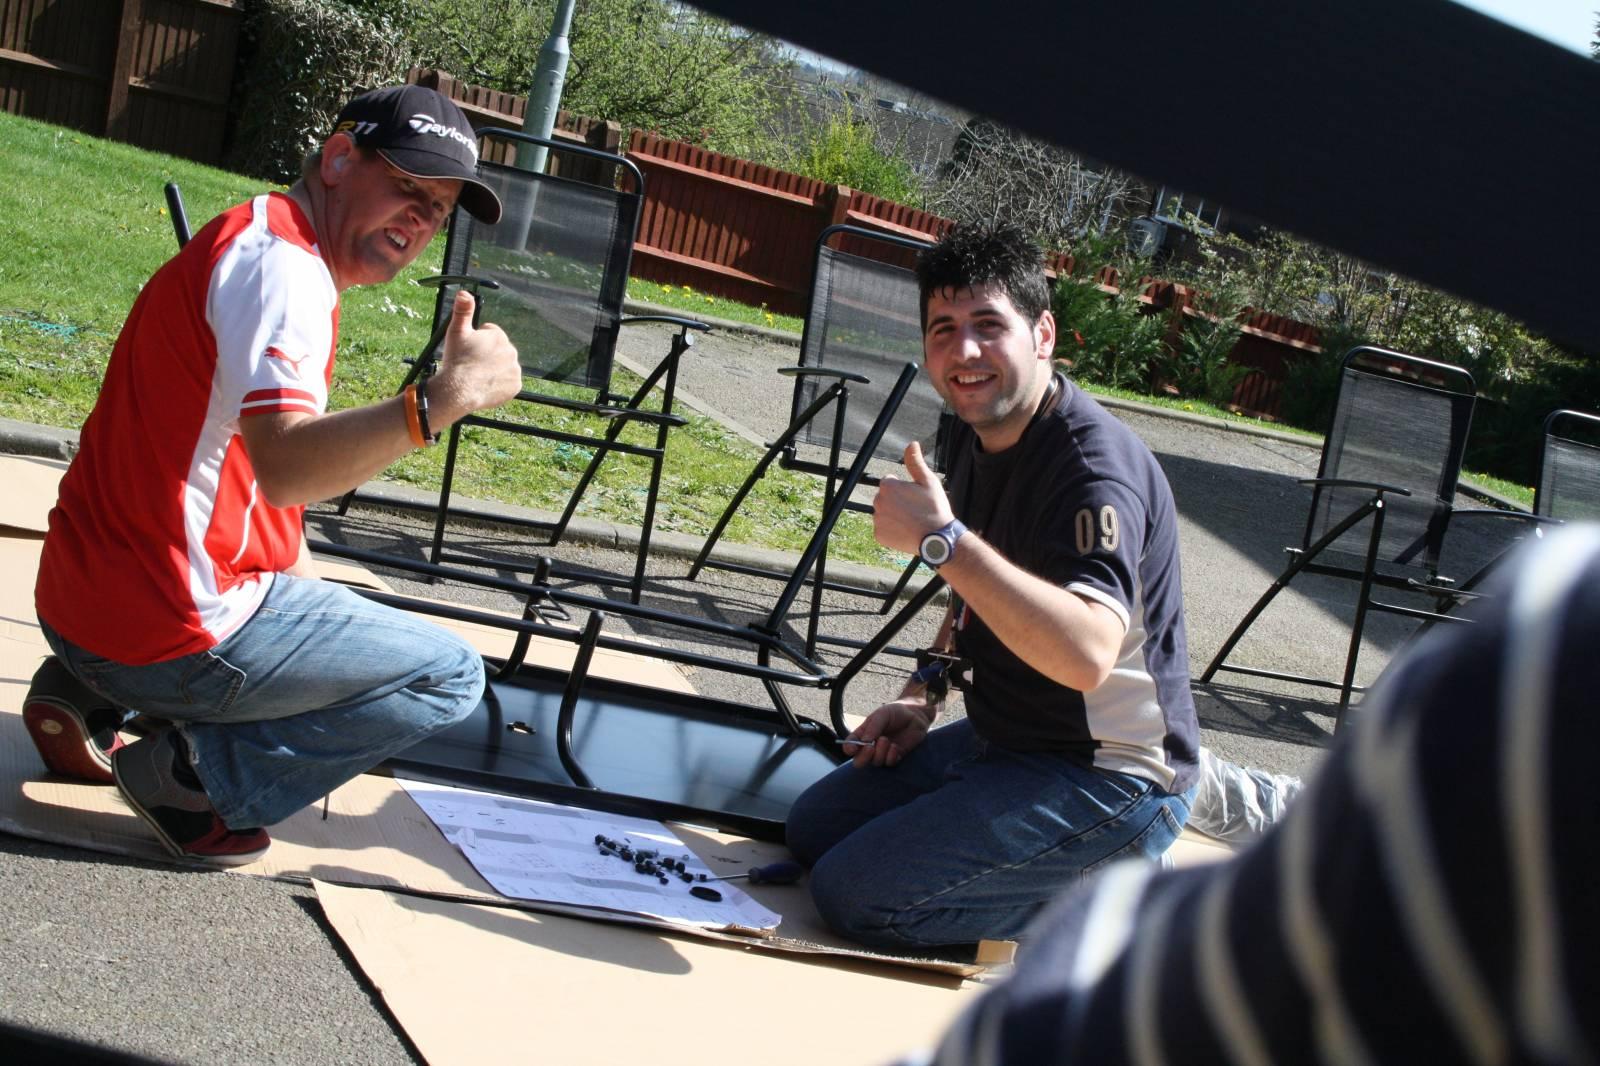 Sean Helping Chris ©Sean/Sense/PhotoVoice